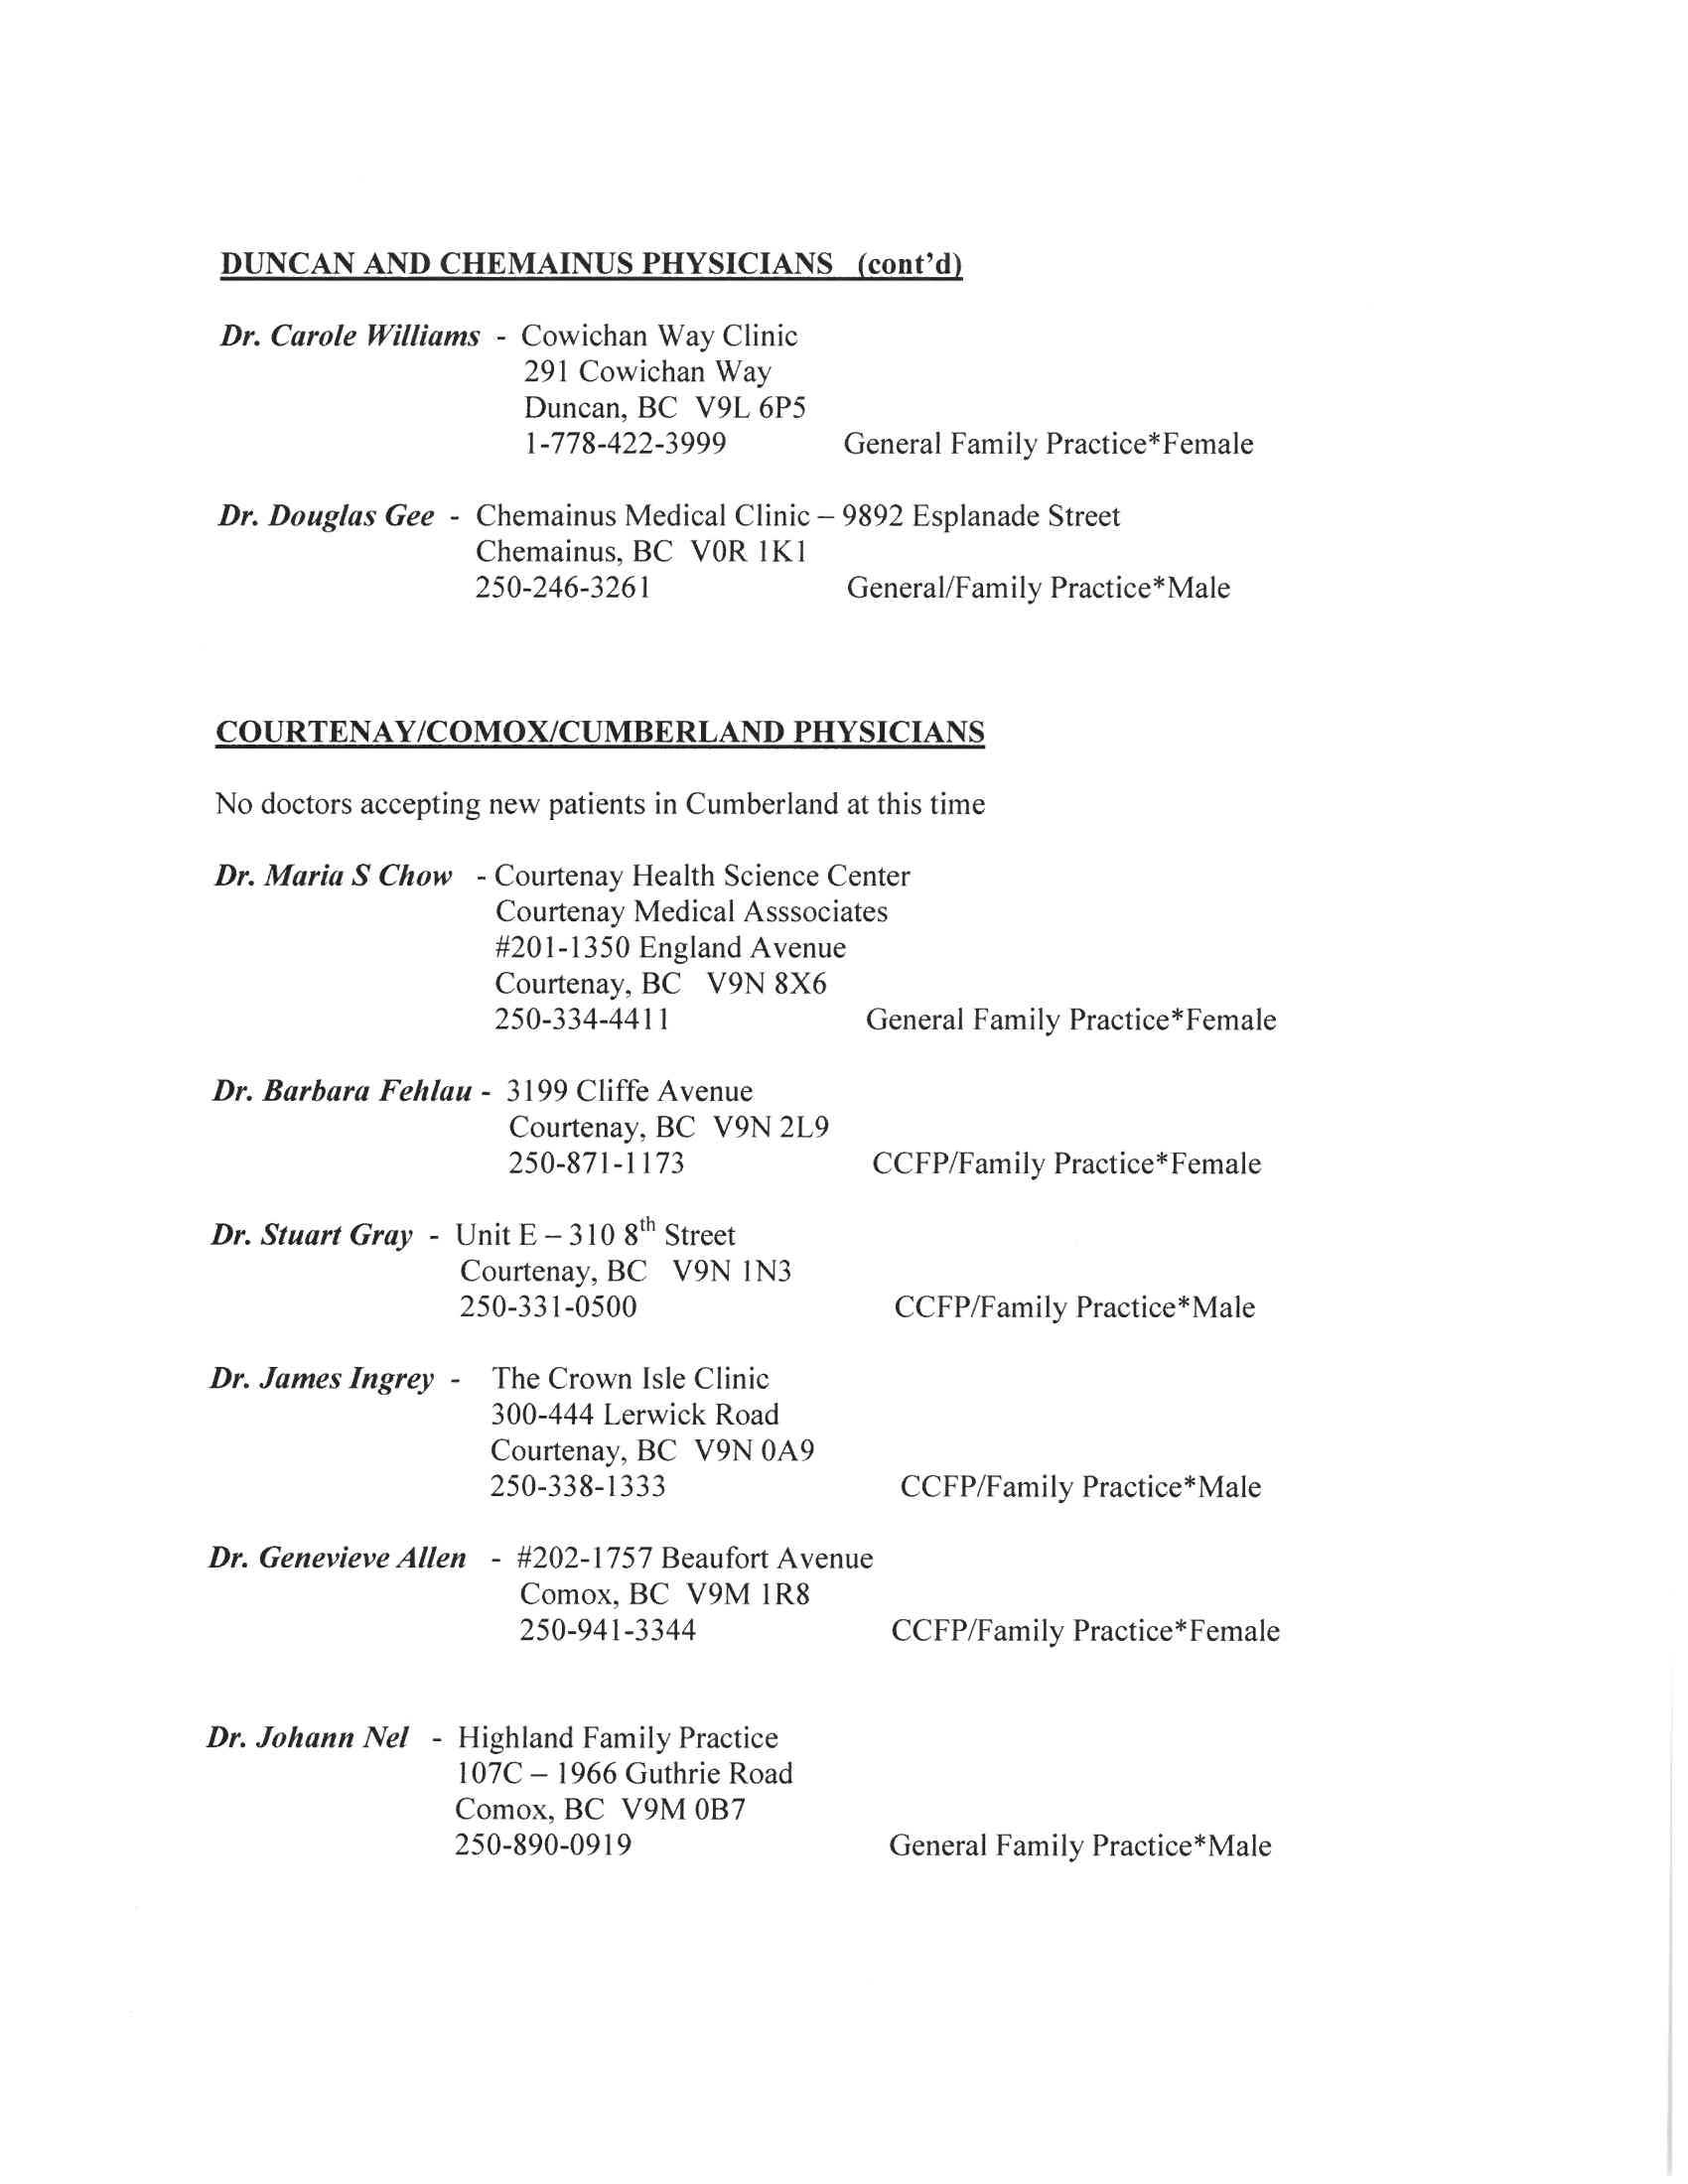 TFN Bulletin June 1-2016 Part 2_Page_09.jpg